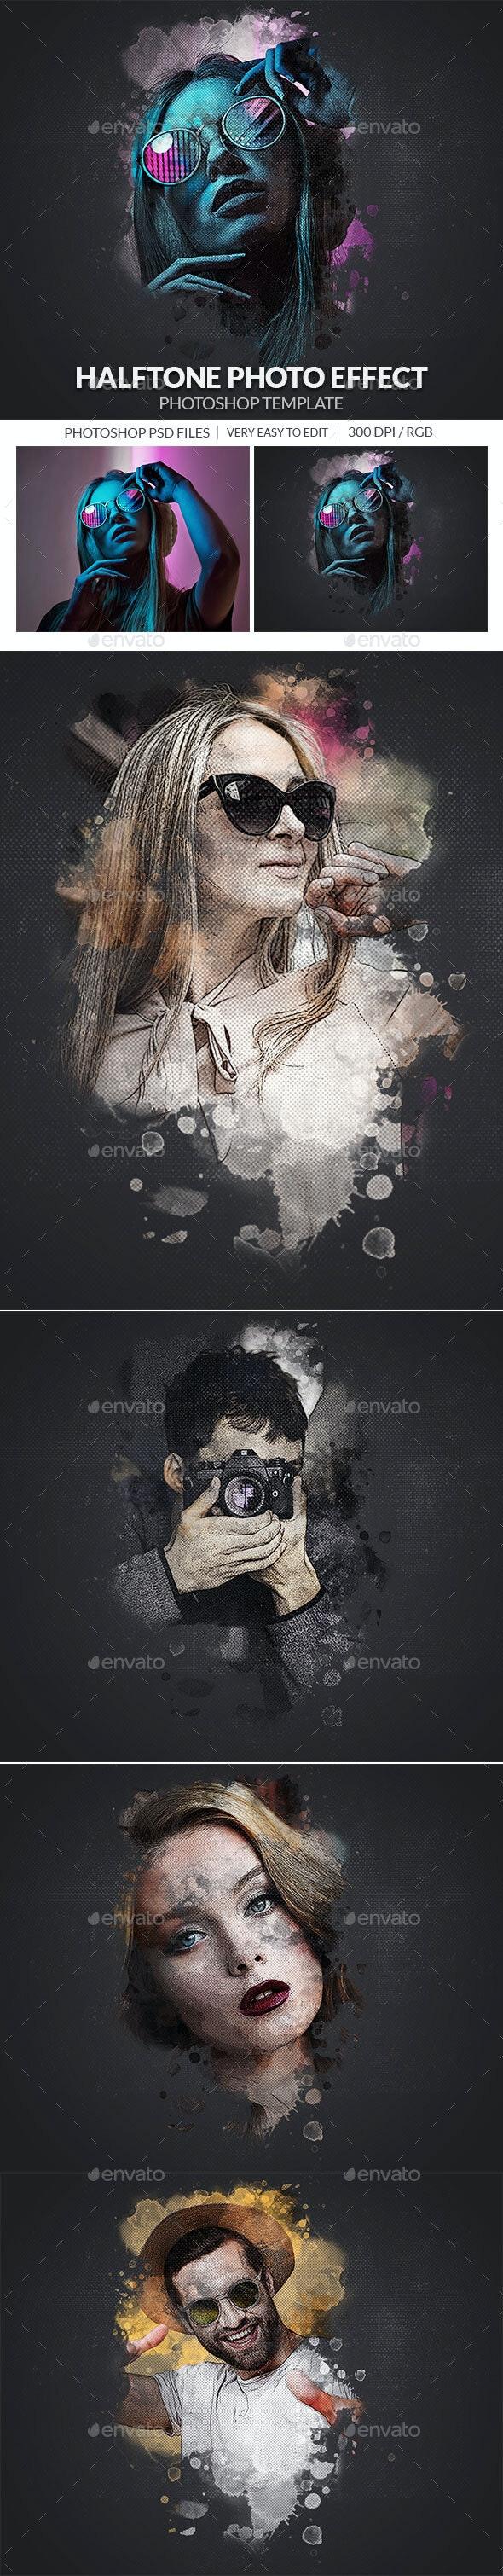 Halftone Photo Effect Template - Artistic Photo Templates